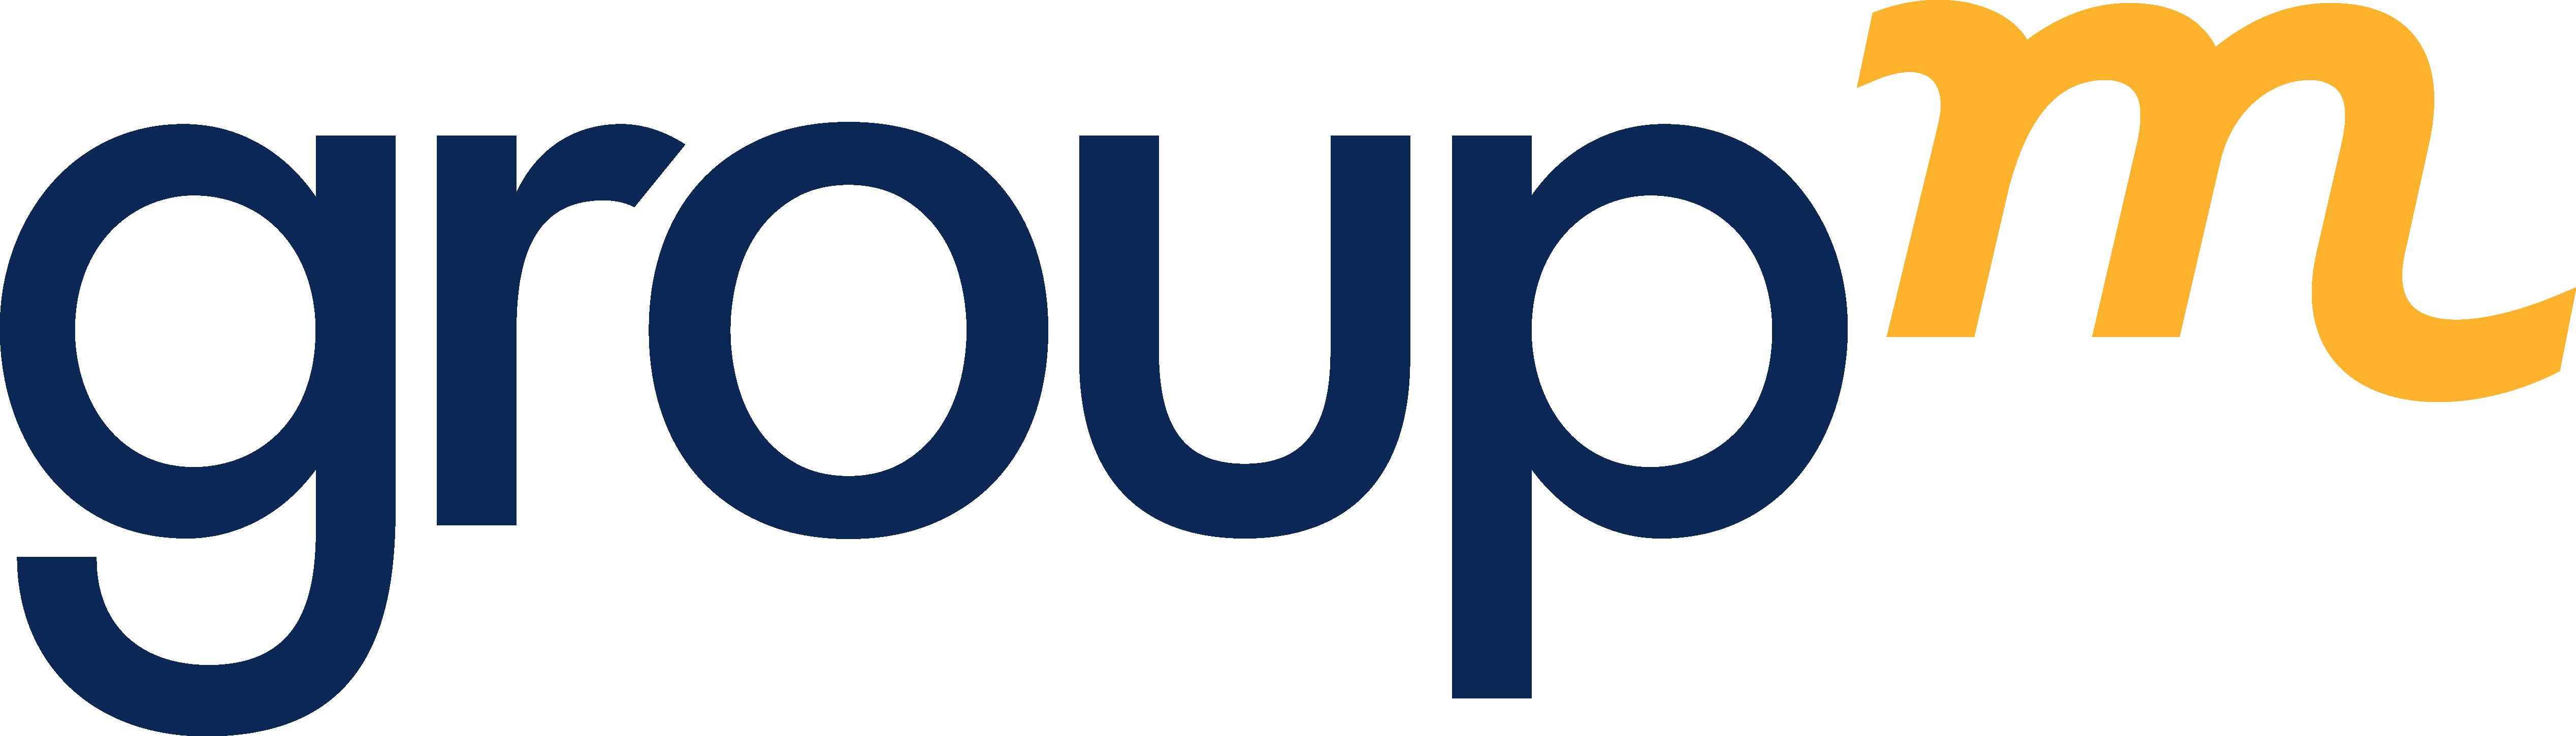 Customer Logo #5 of Nordic Data Resources